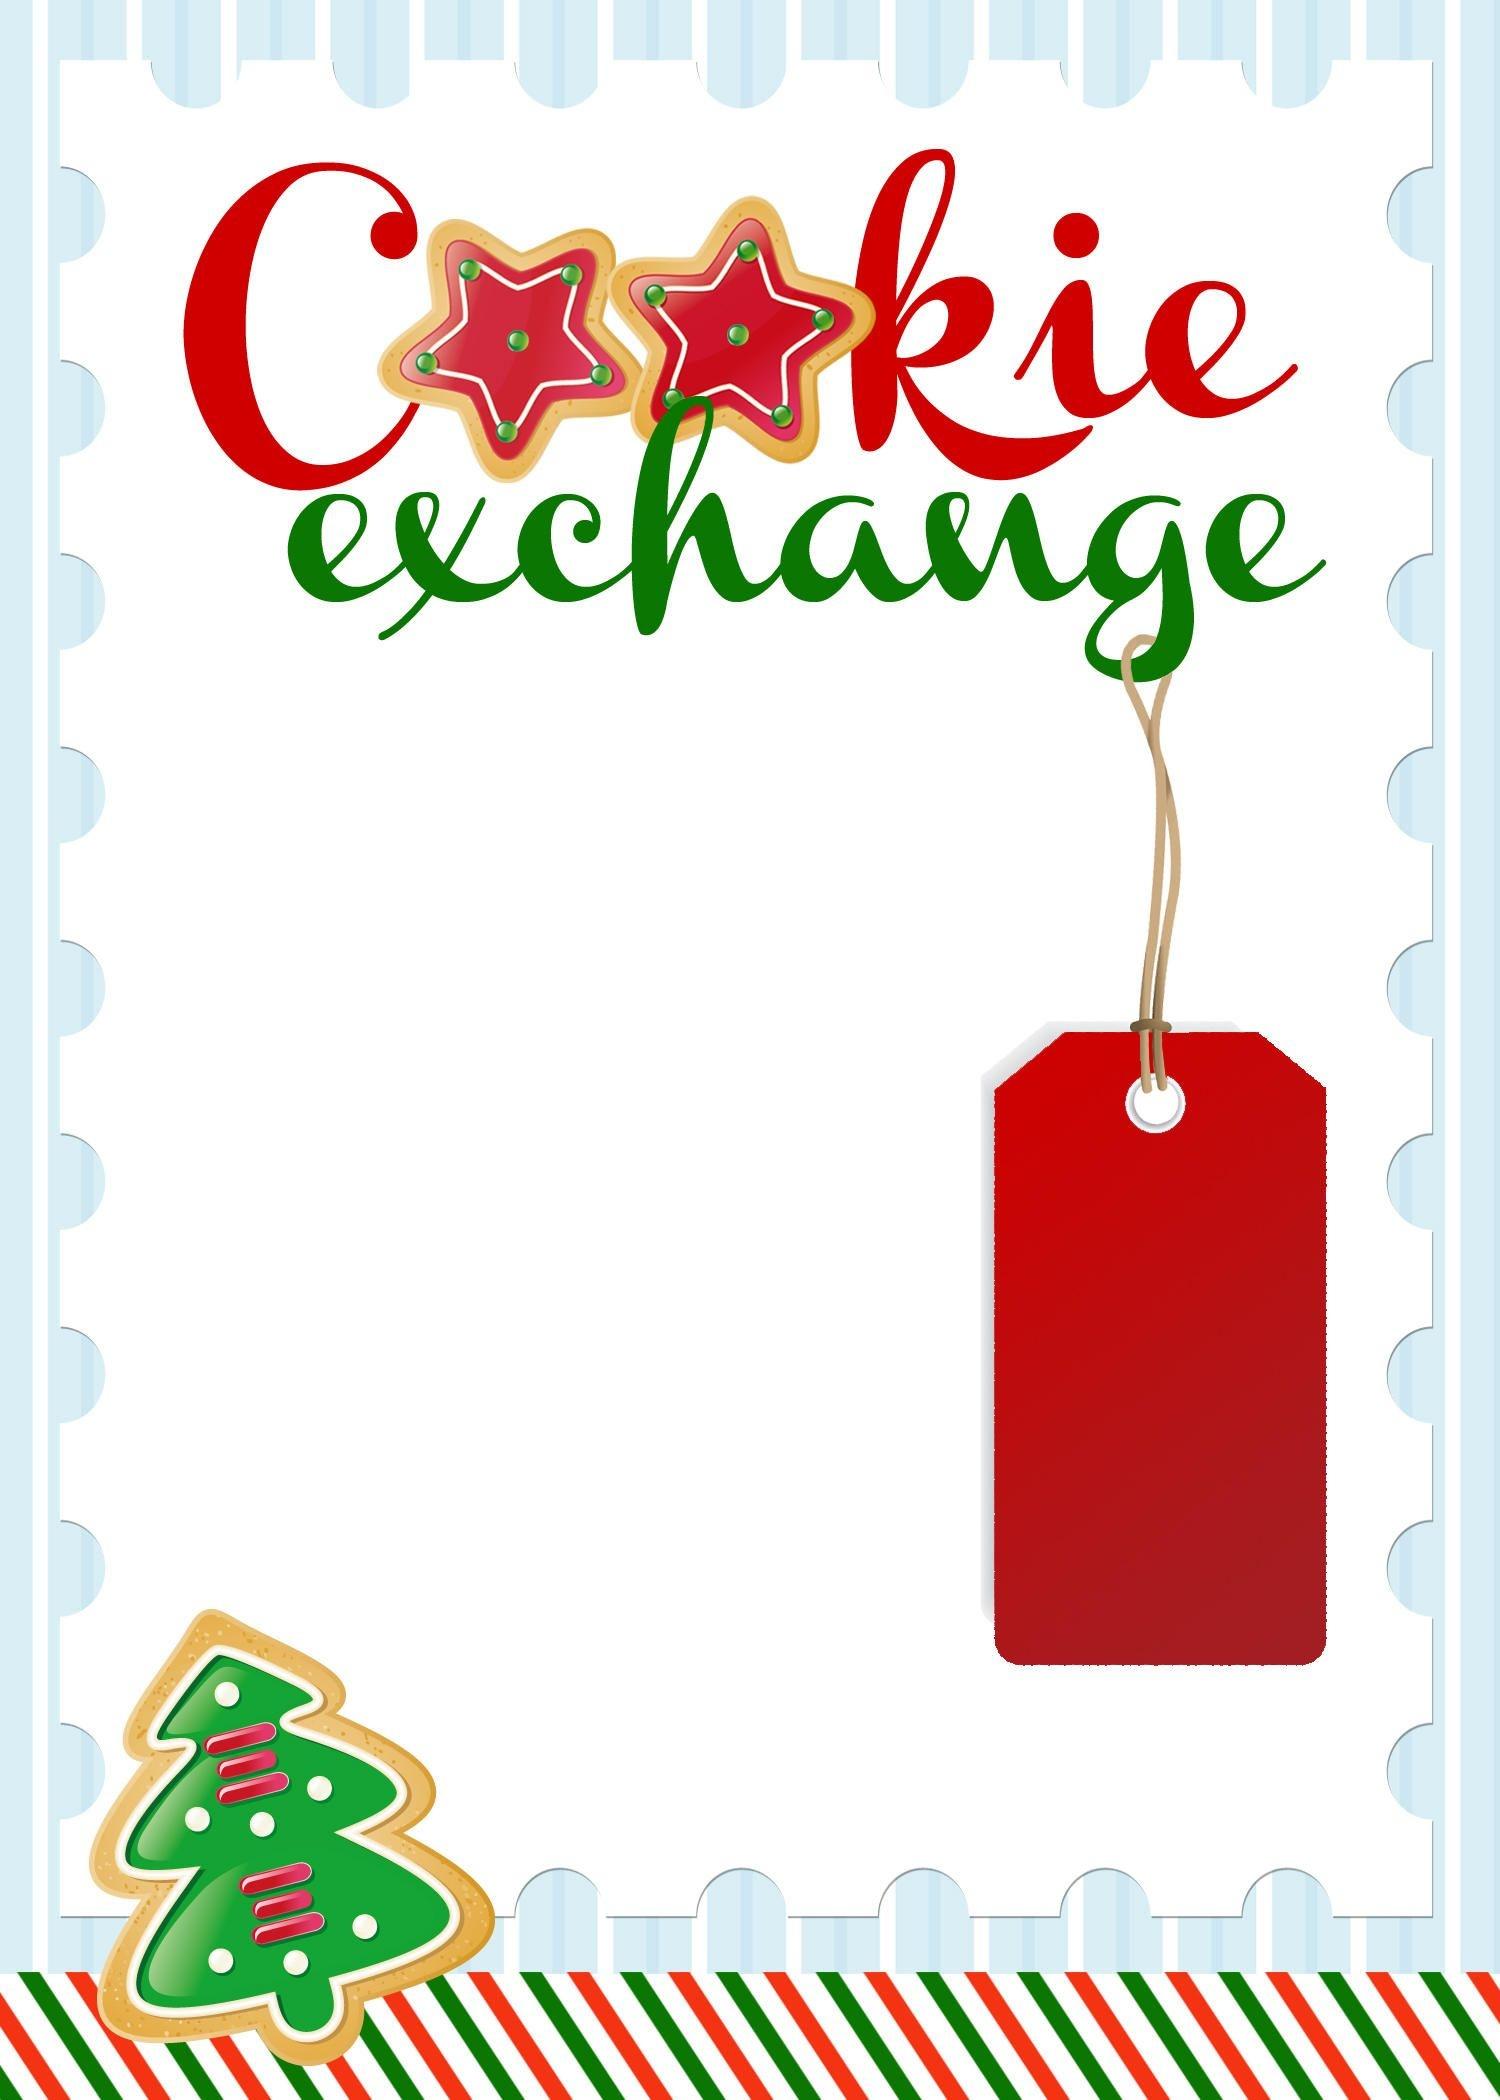 Christmas Party Invitation Templates Free Printable   Pretty - Christmas Party Invitation Templates Free Printable